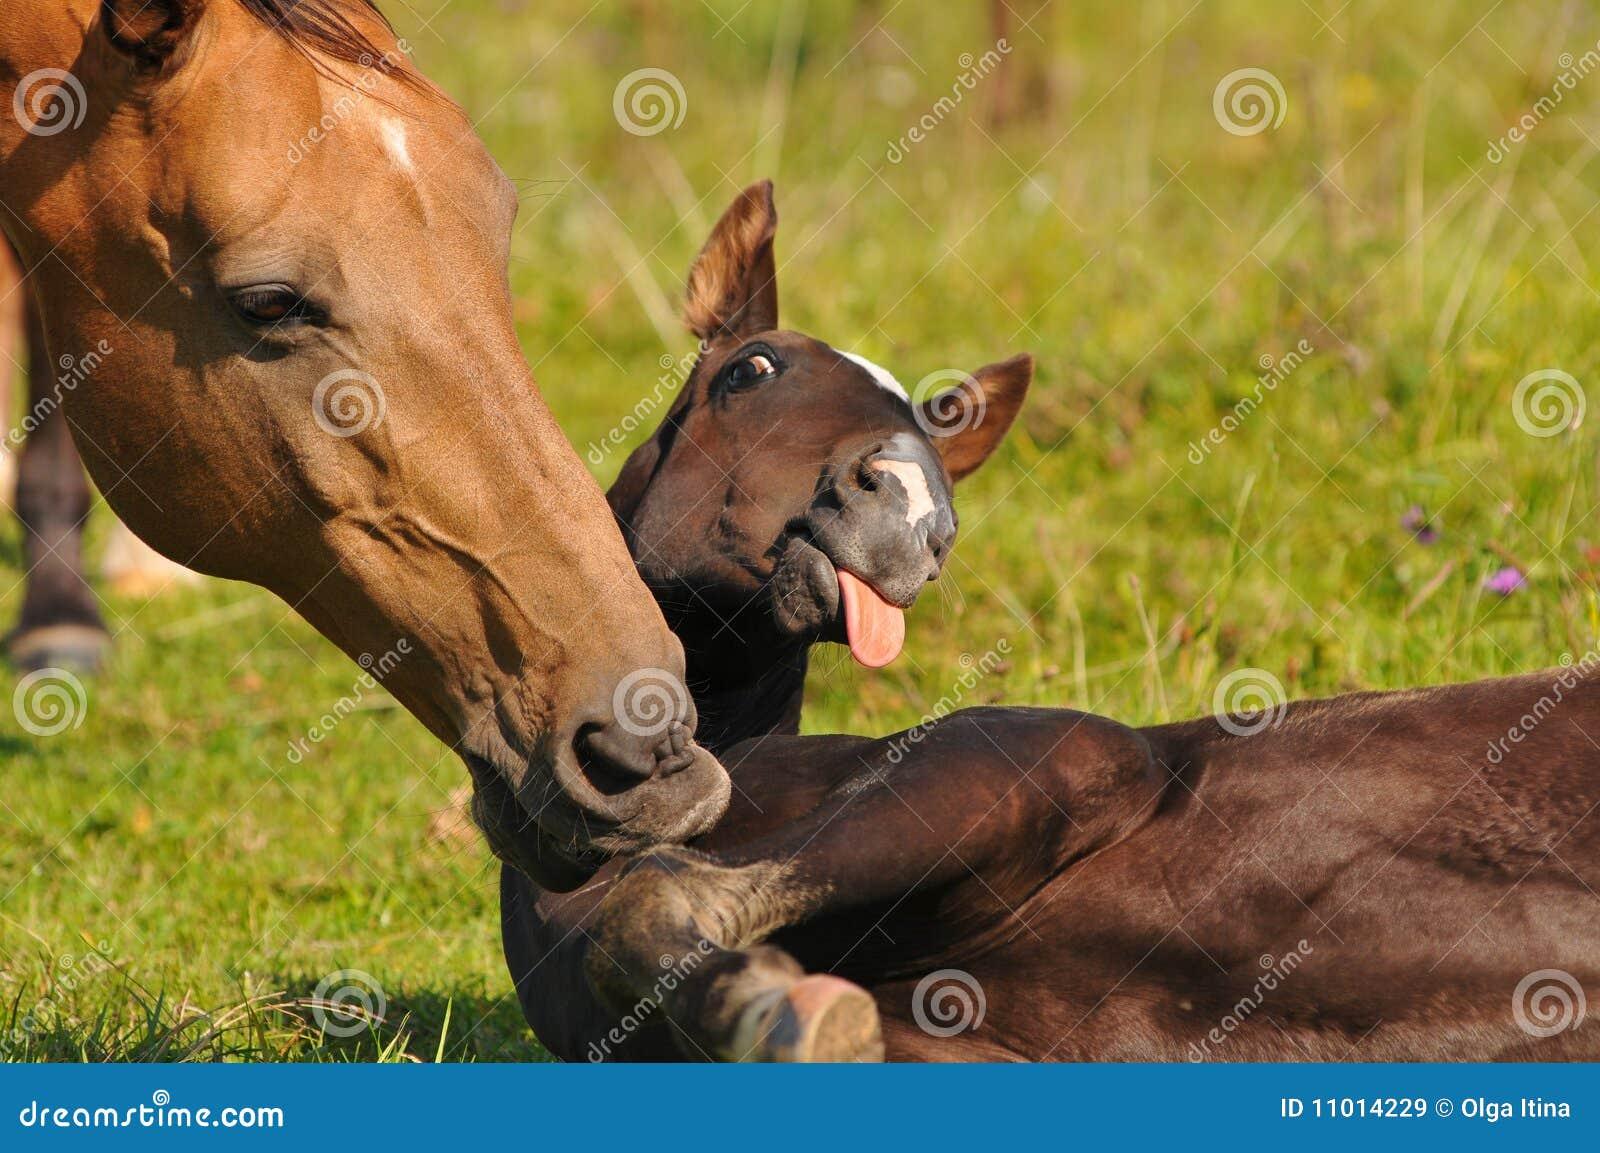 Akhal-teke mare and foal